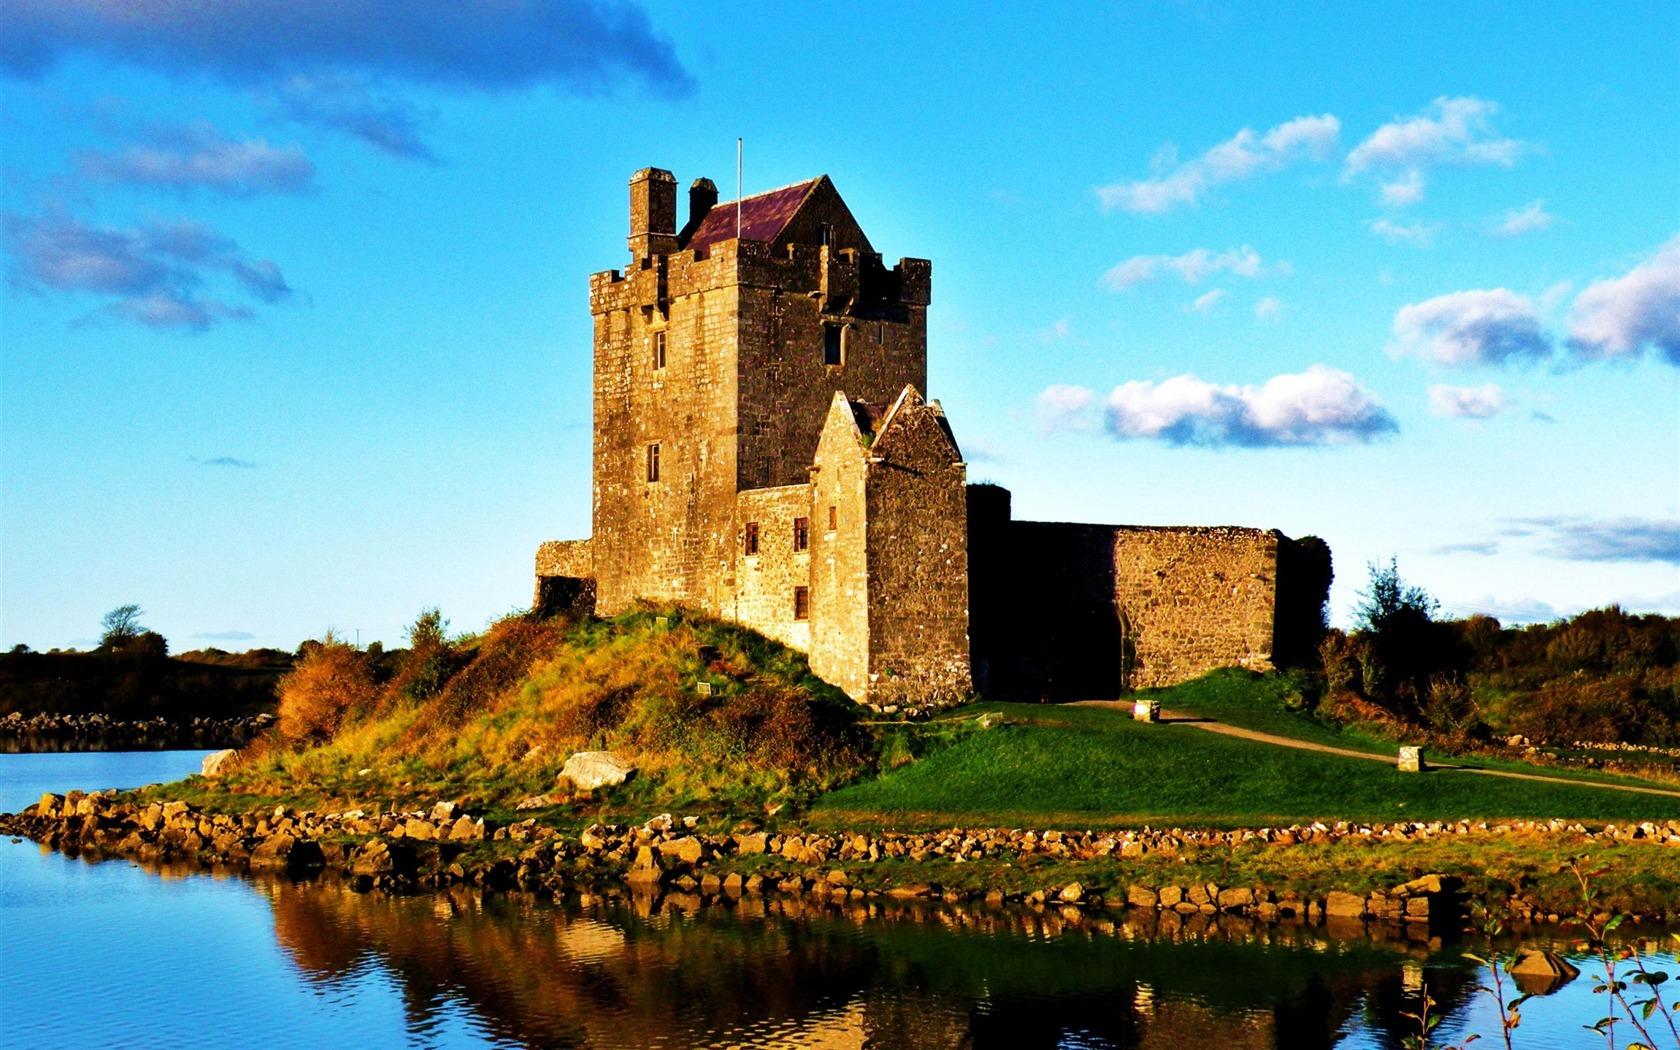 1680x1050 hidden castle scenery - photo #11